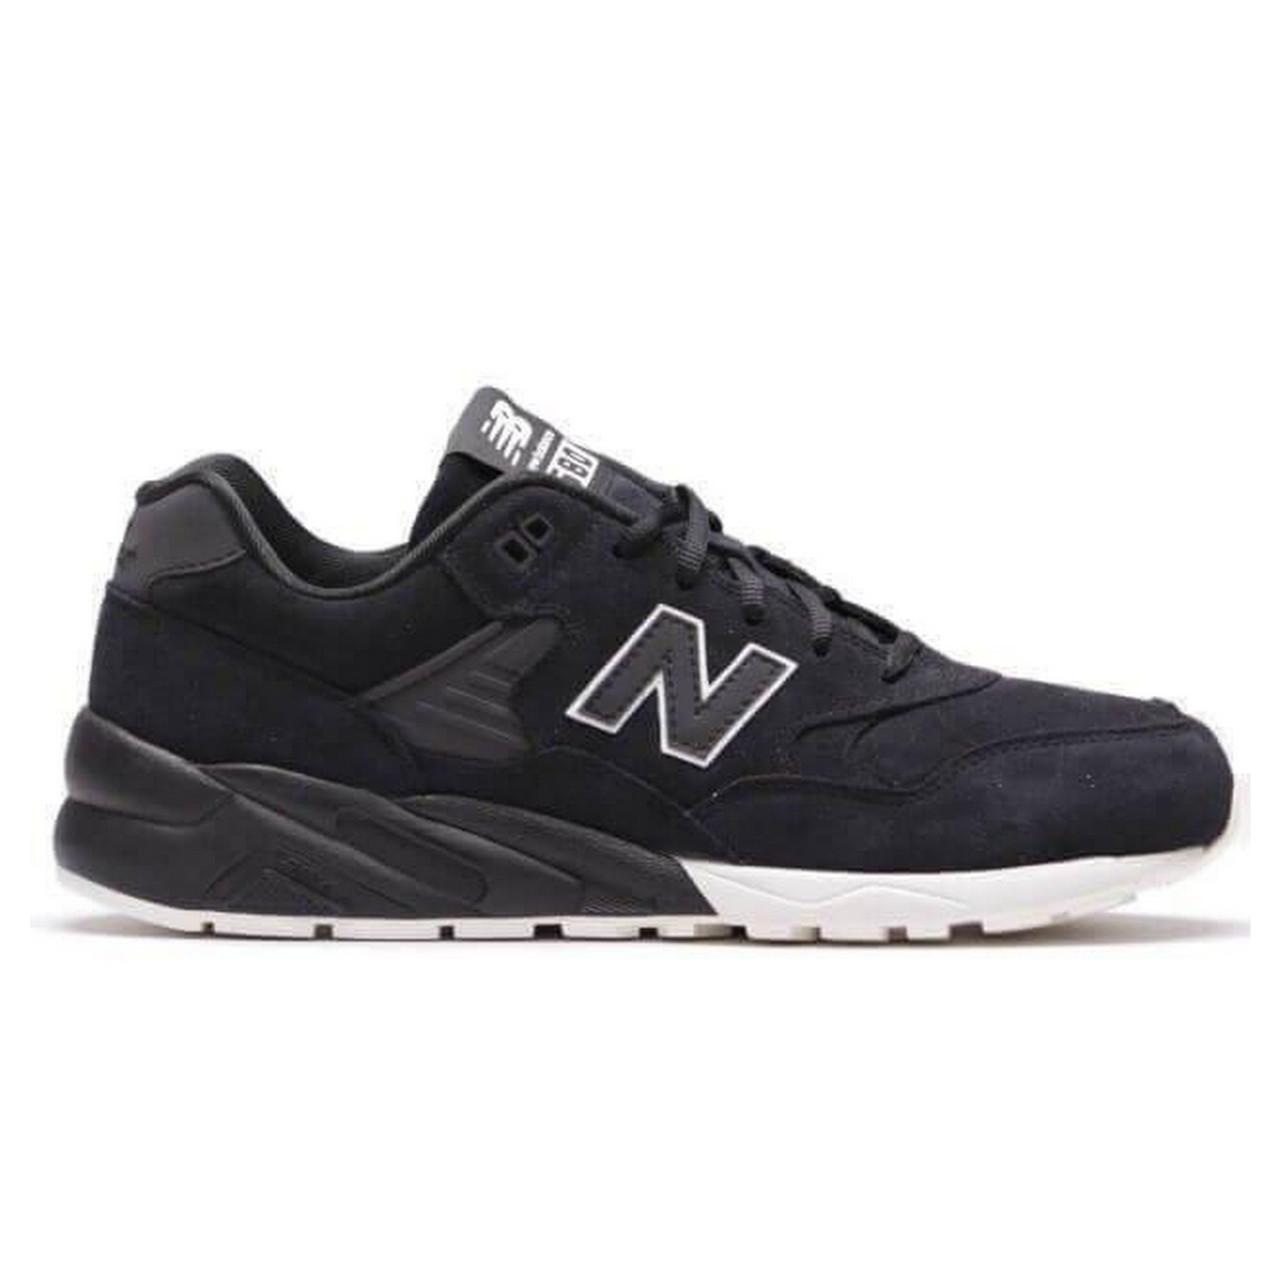 531eba438999 Кроссовки мужские New Balance 580 All Black (в стиле Нью Беланс ...